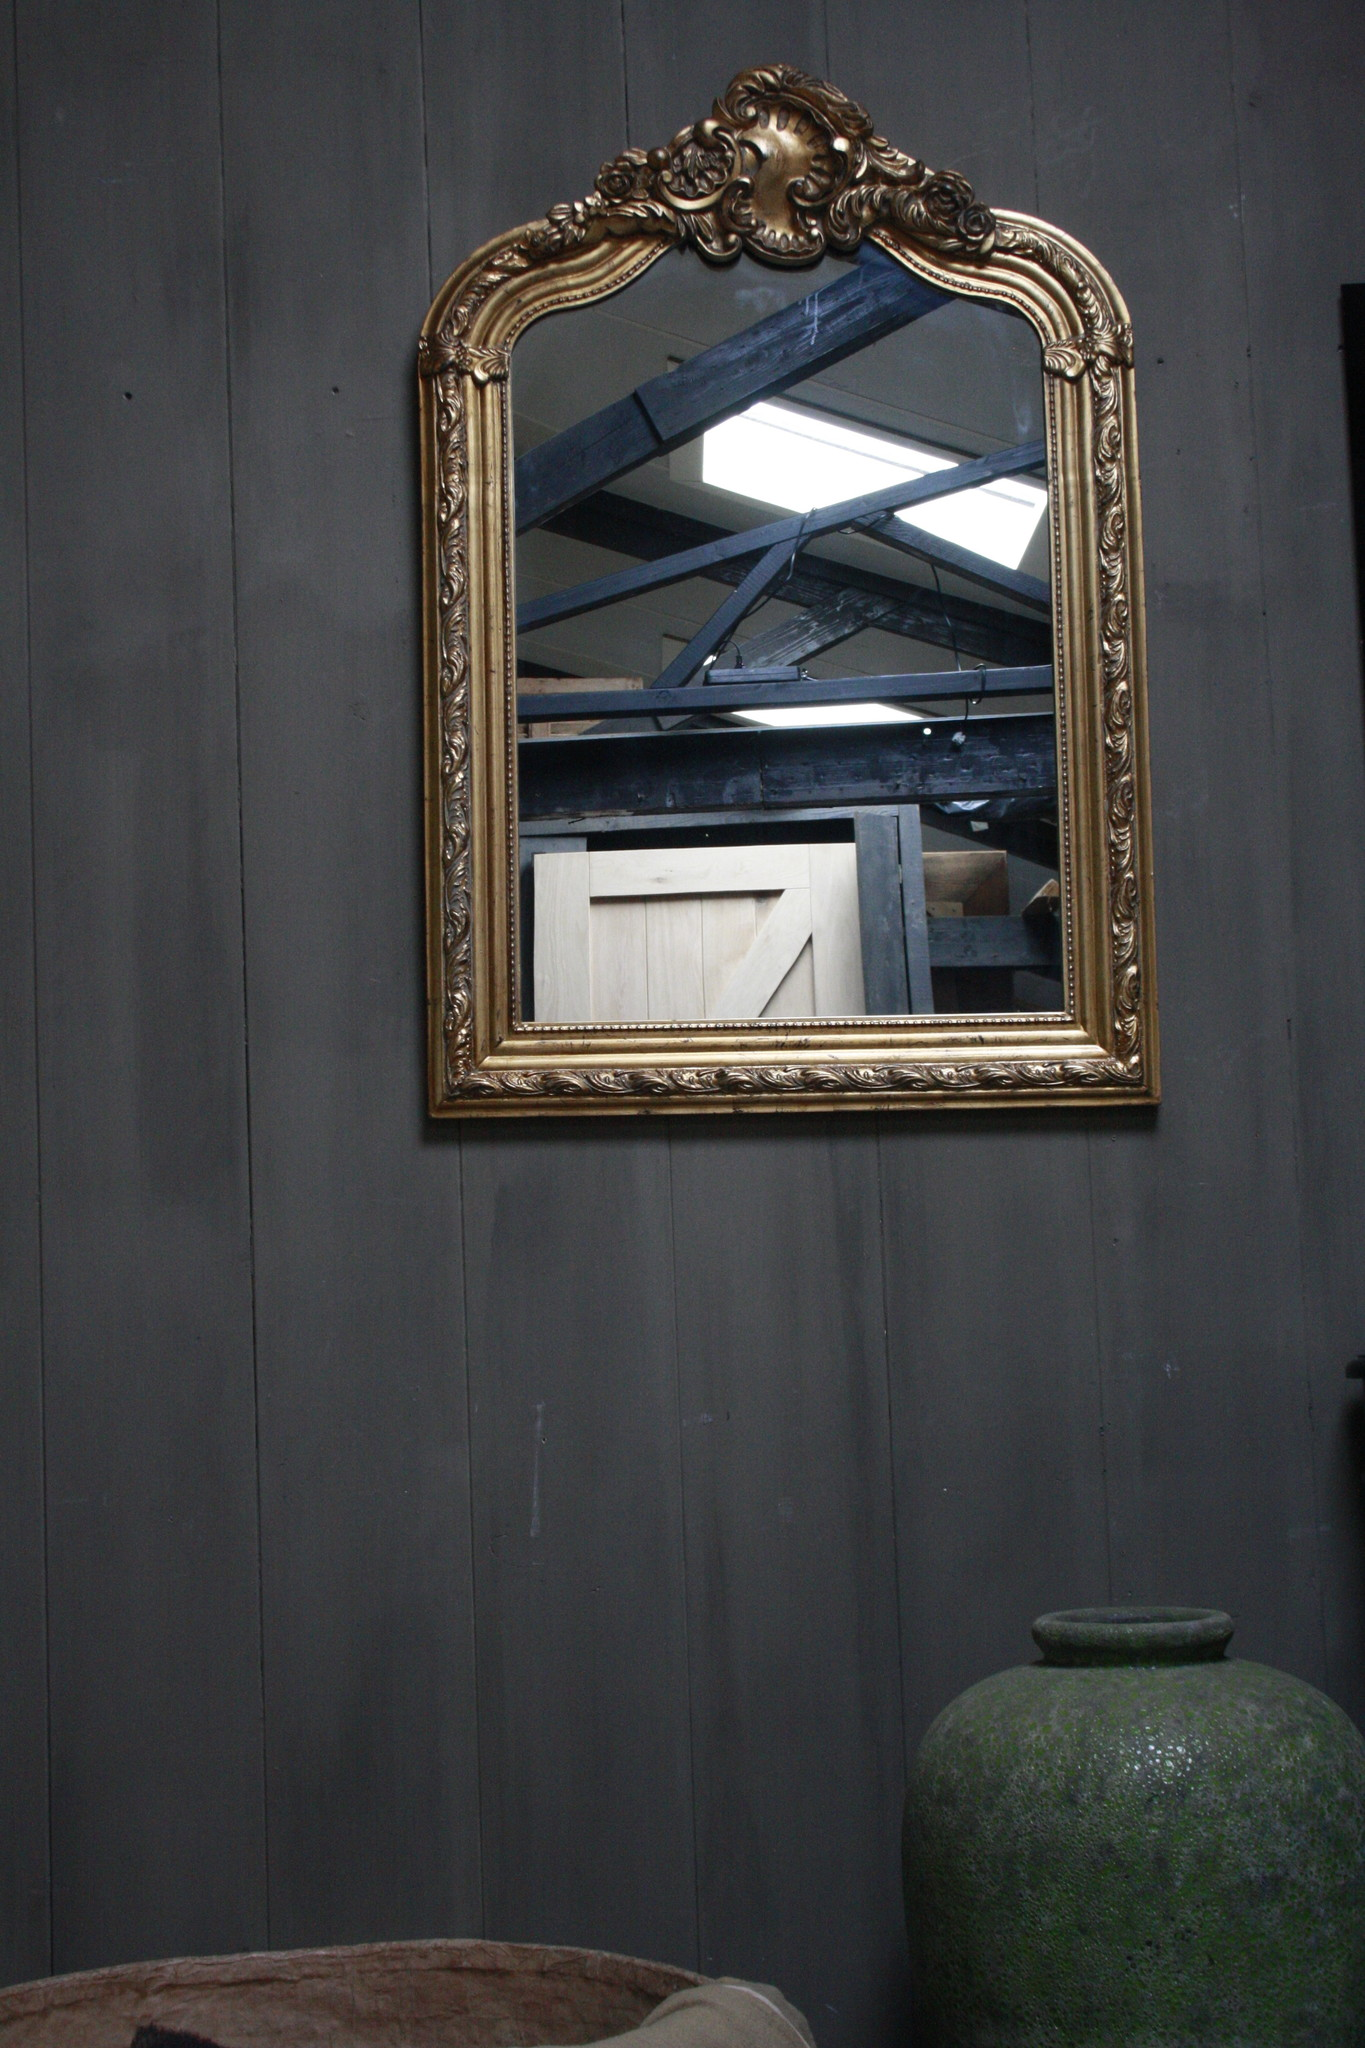 Kuifspiegel Barok Roma Goud 117 x 80 cm-1